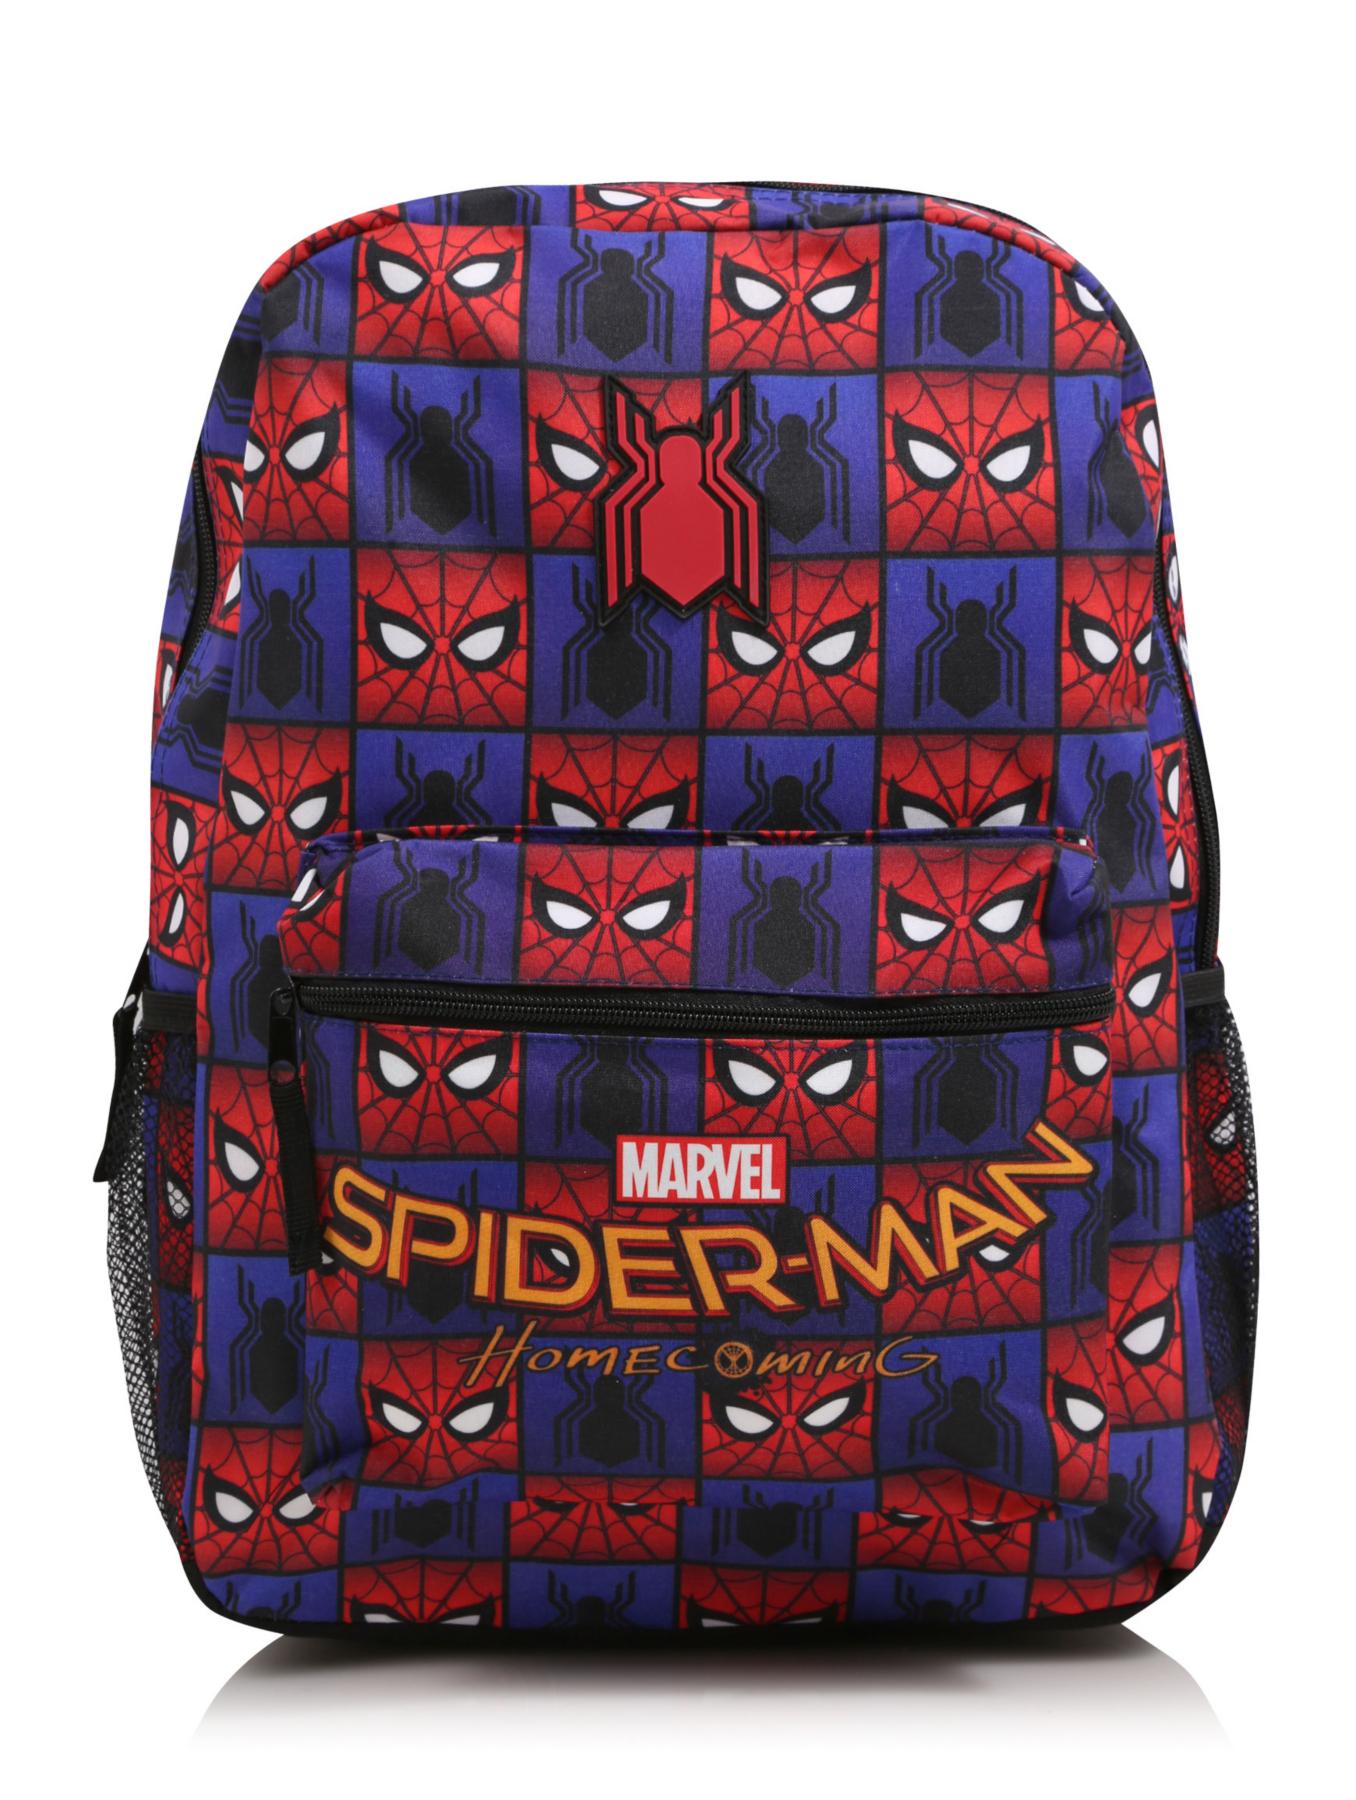 Boys Bags Kids Bags & Accessories